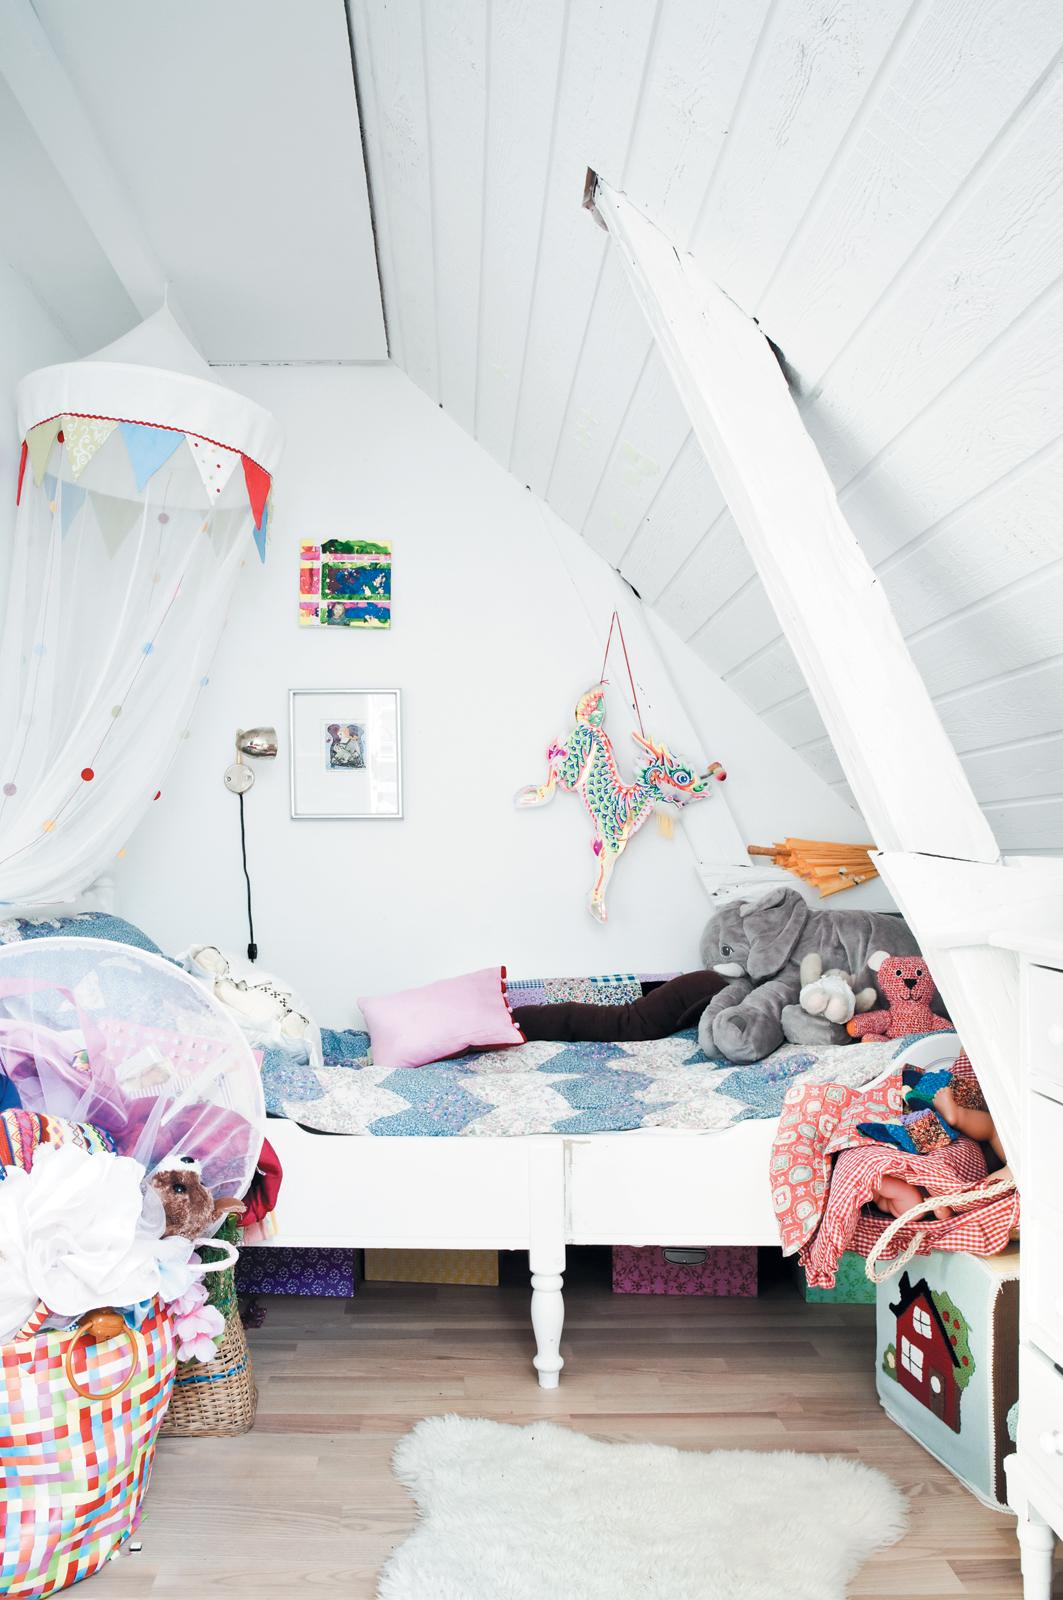 Colorful children's room in attic